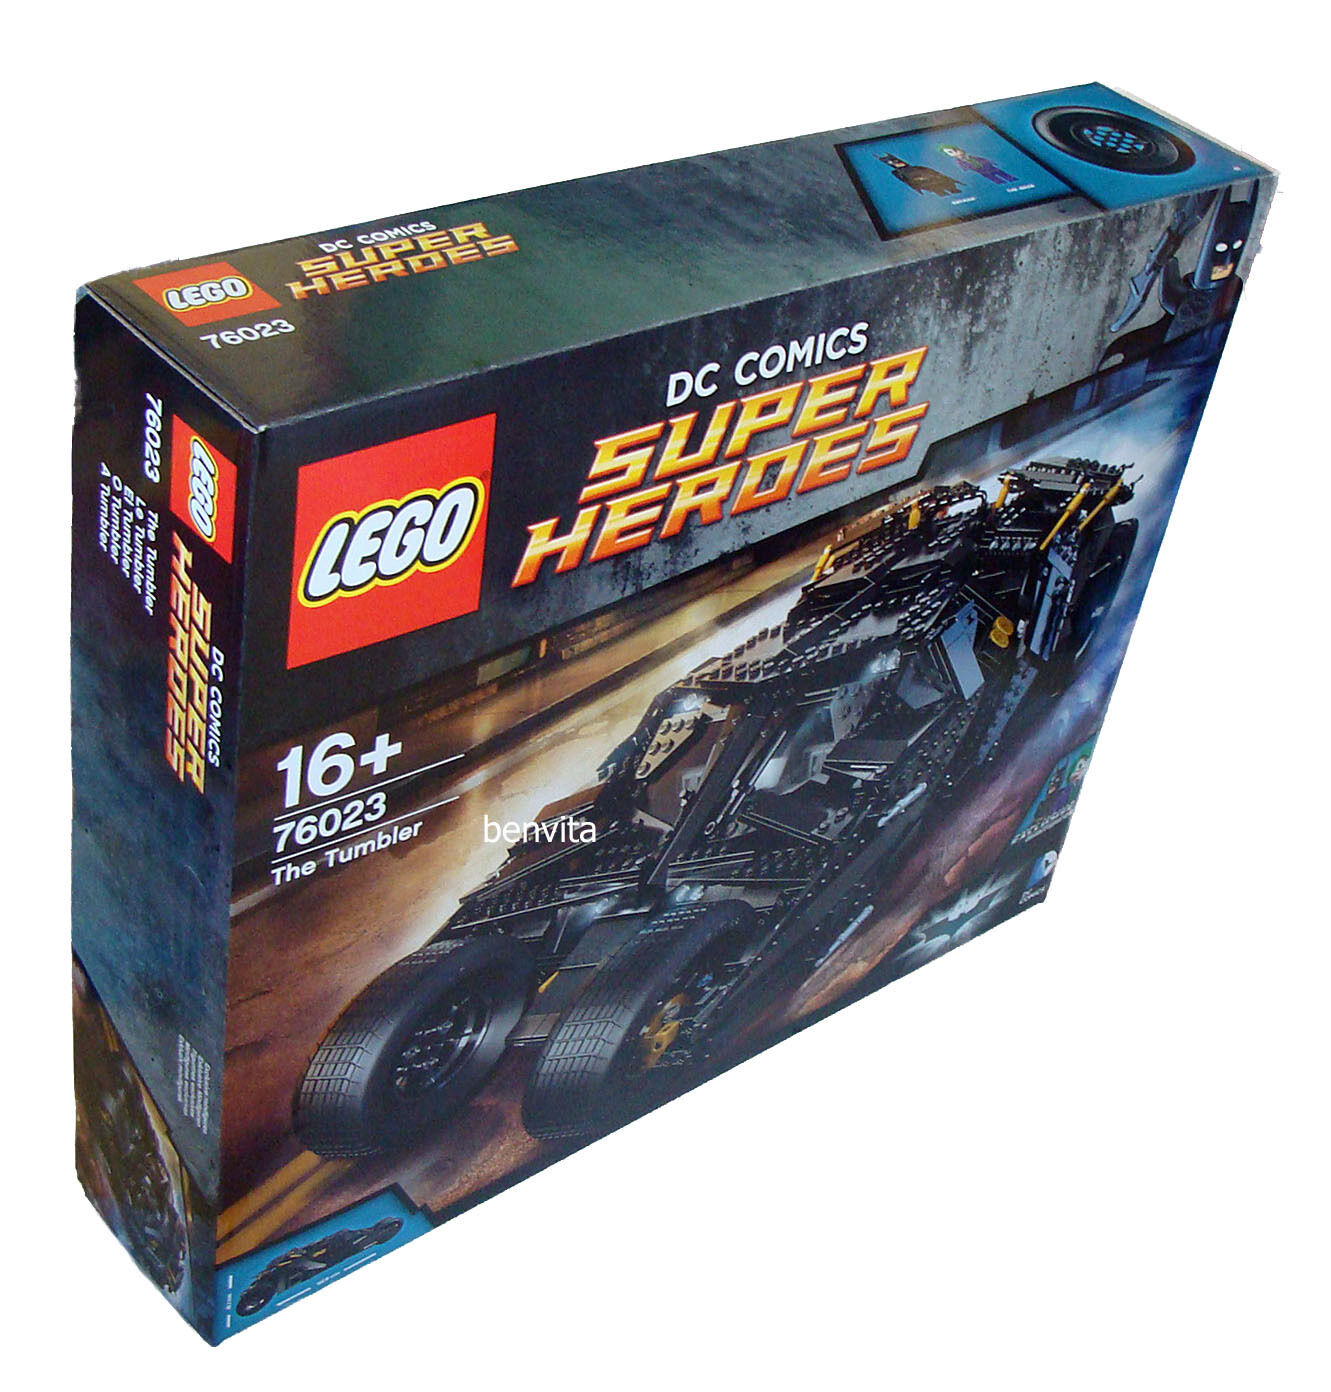 Lego® Super Heroes Heroes Heroes 76023 - The Tumbler 1869 Teile 16+ - Neu bcecee